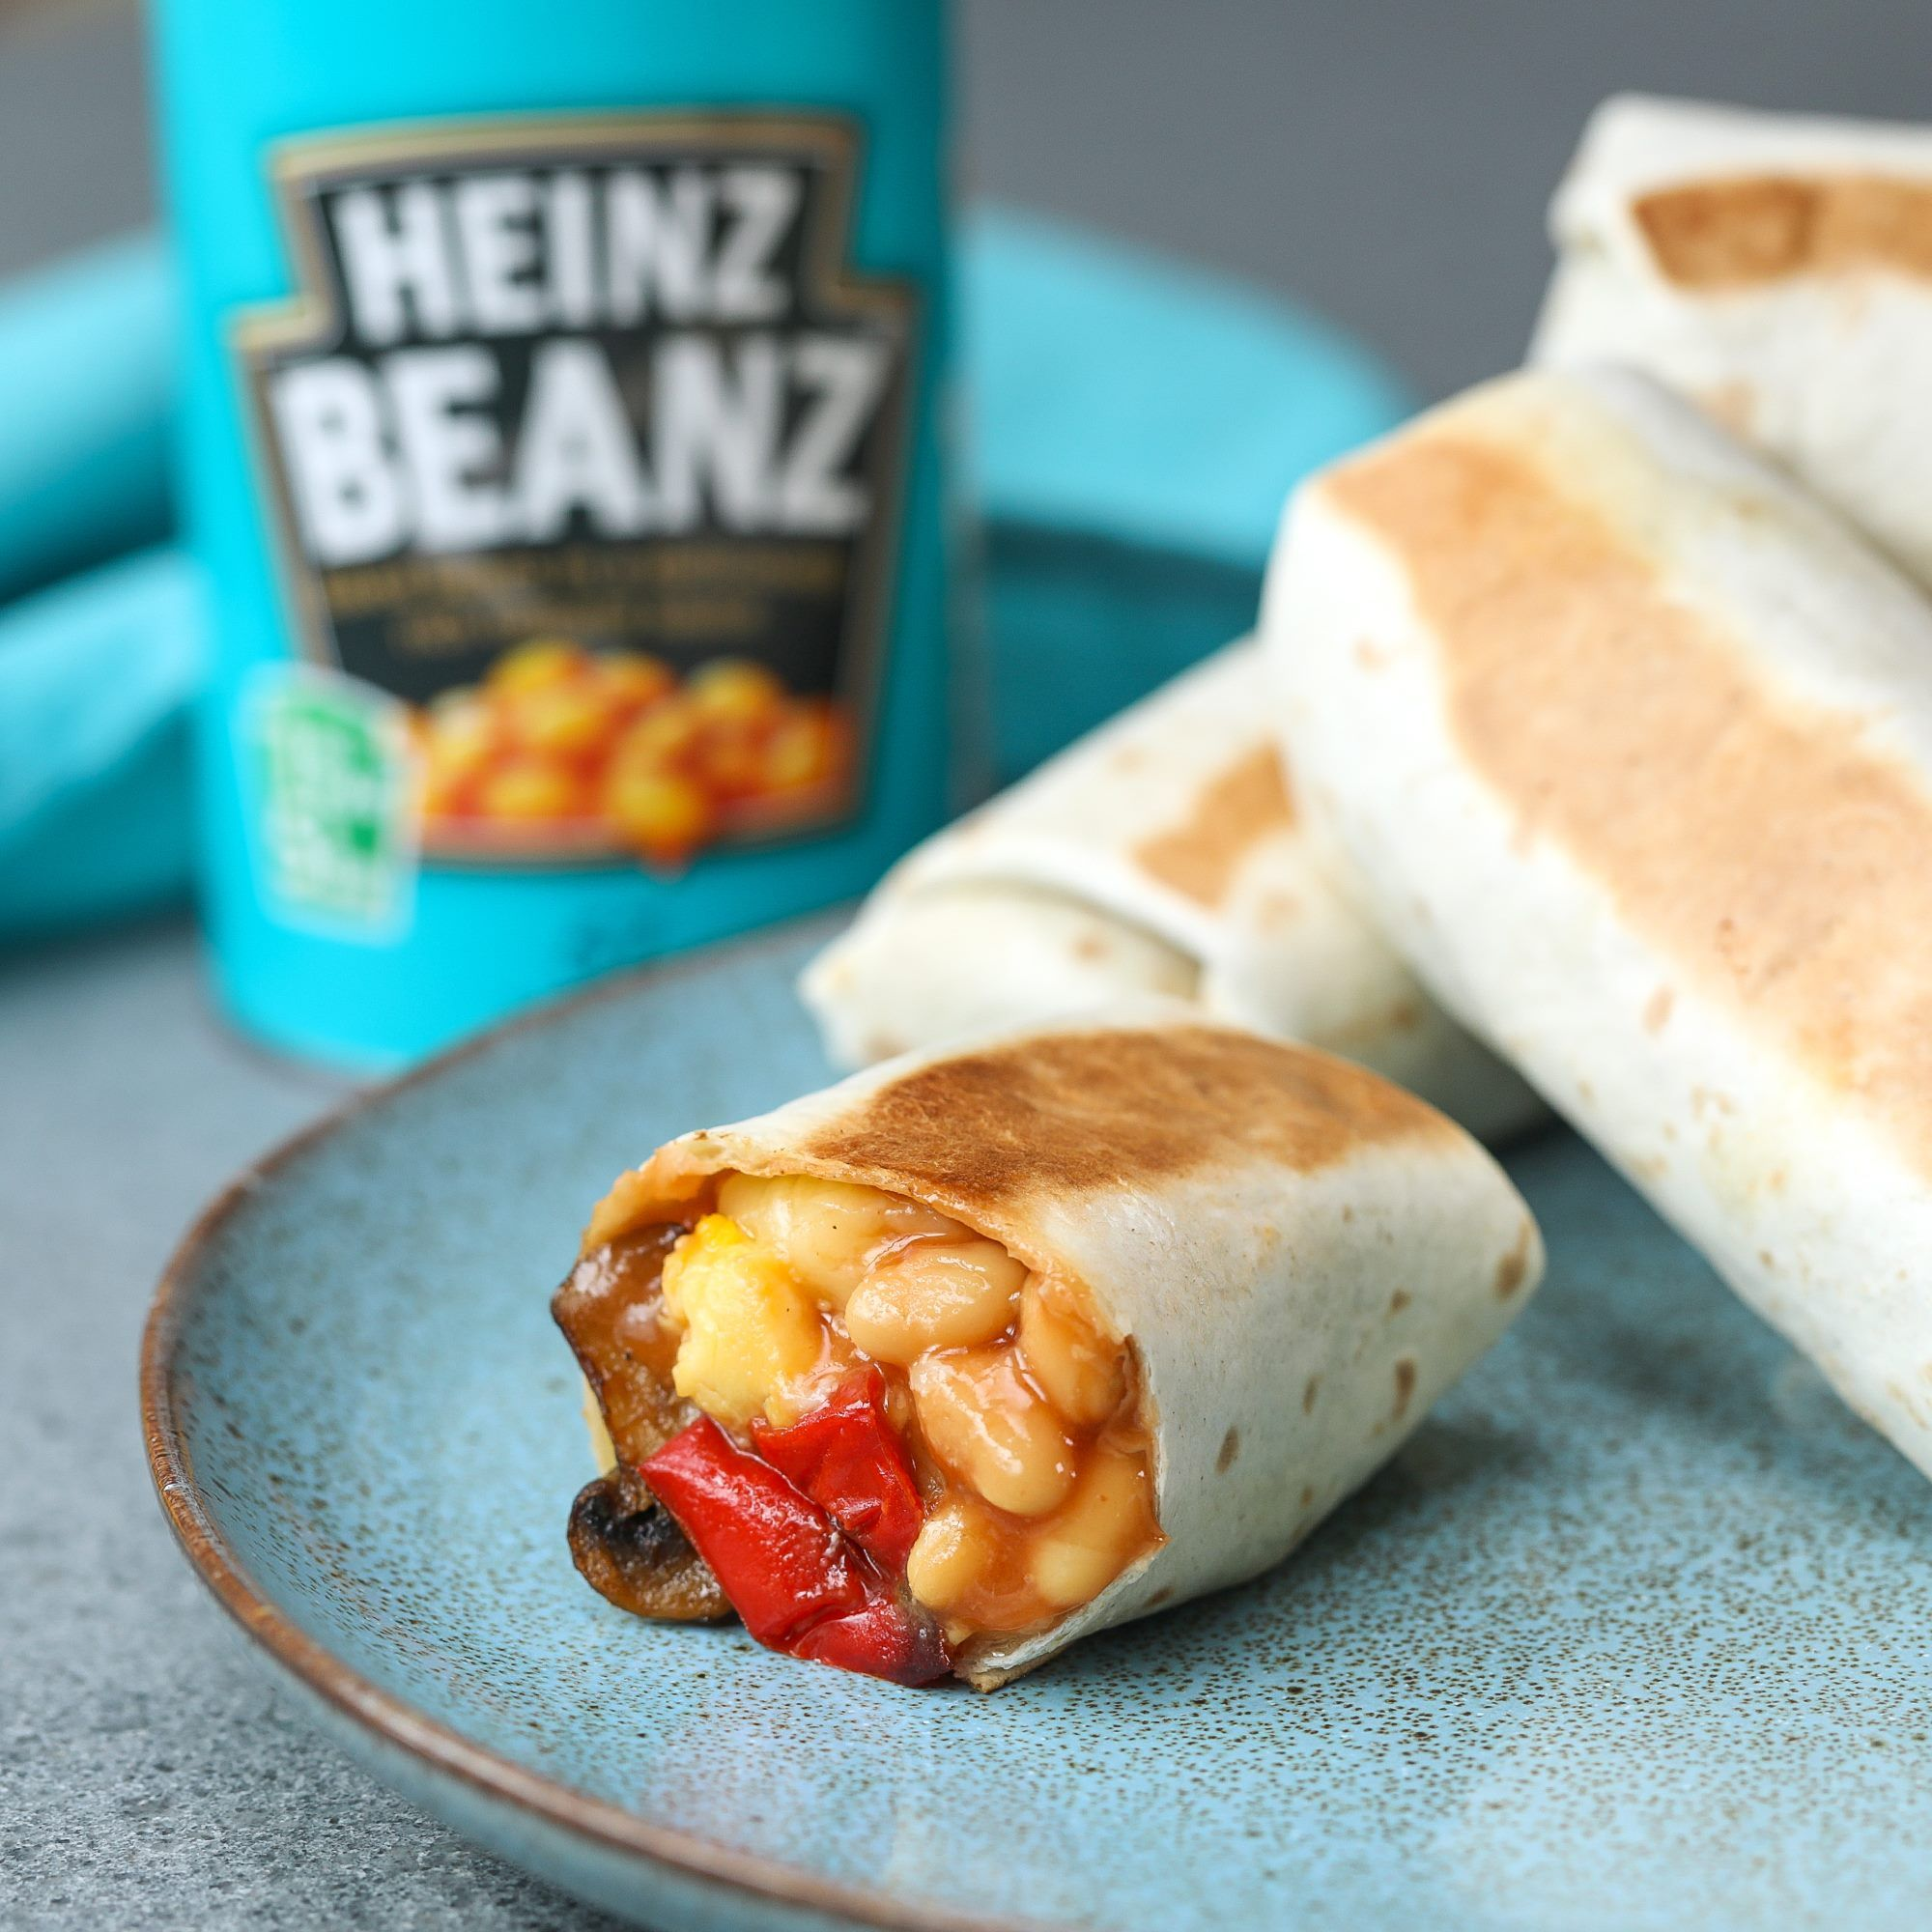 Heinz Beanz Breakfast Burrito 5 Trending Recipes With Videos Recipe Breakfast Burritos Recipes Food